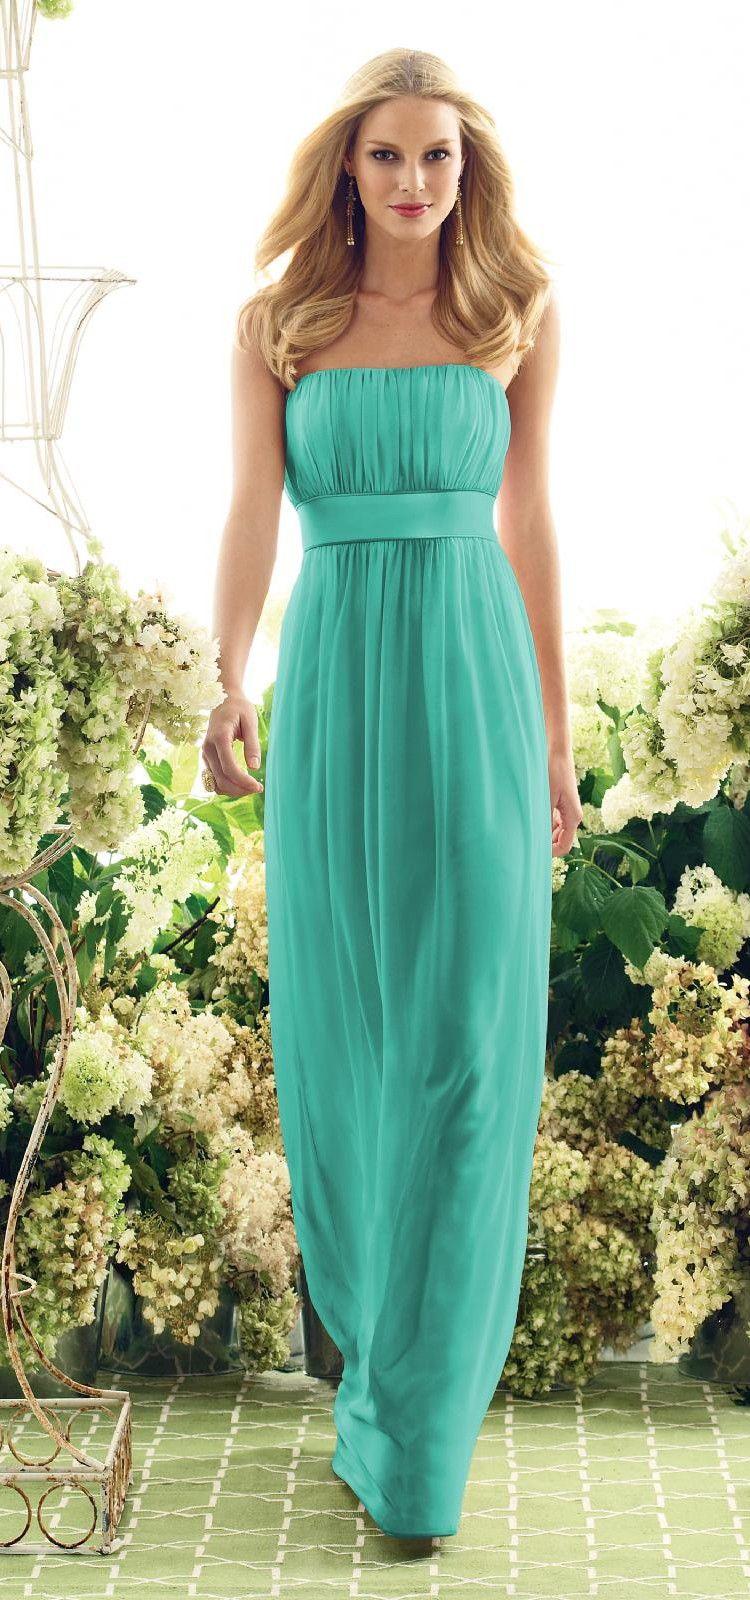 Turquoise bridesmaid dresses on pinterest turquoise for Turquoise wedding dresses for bridesmaids